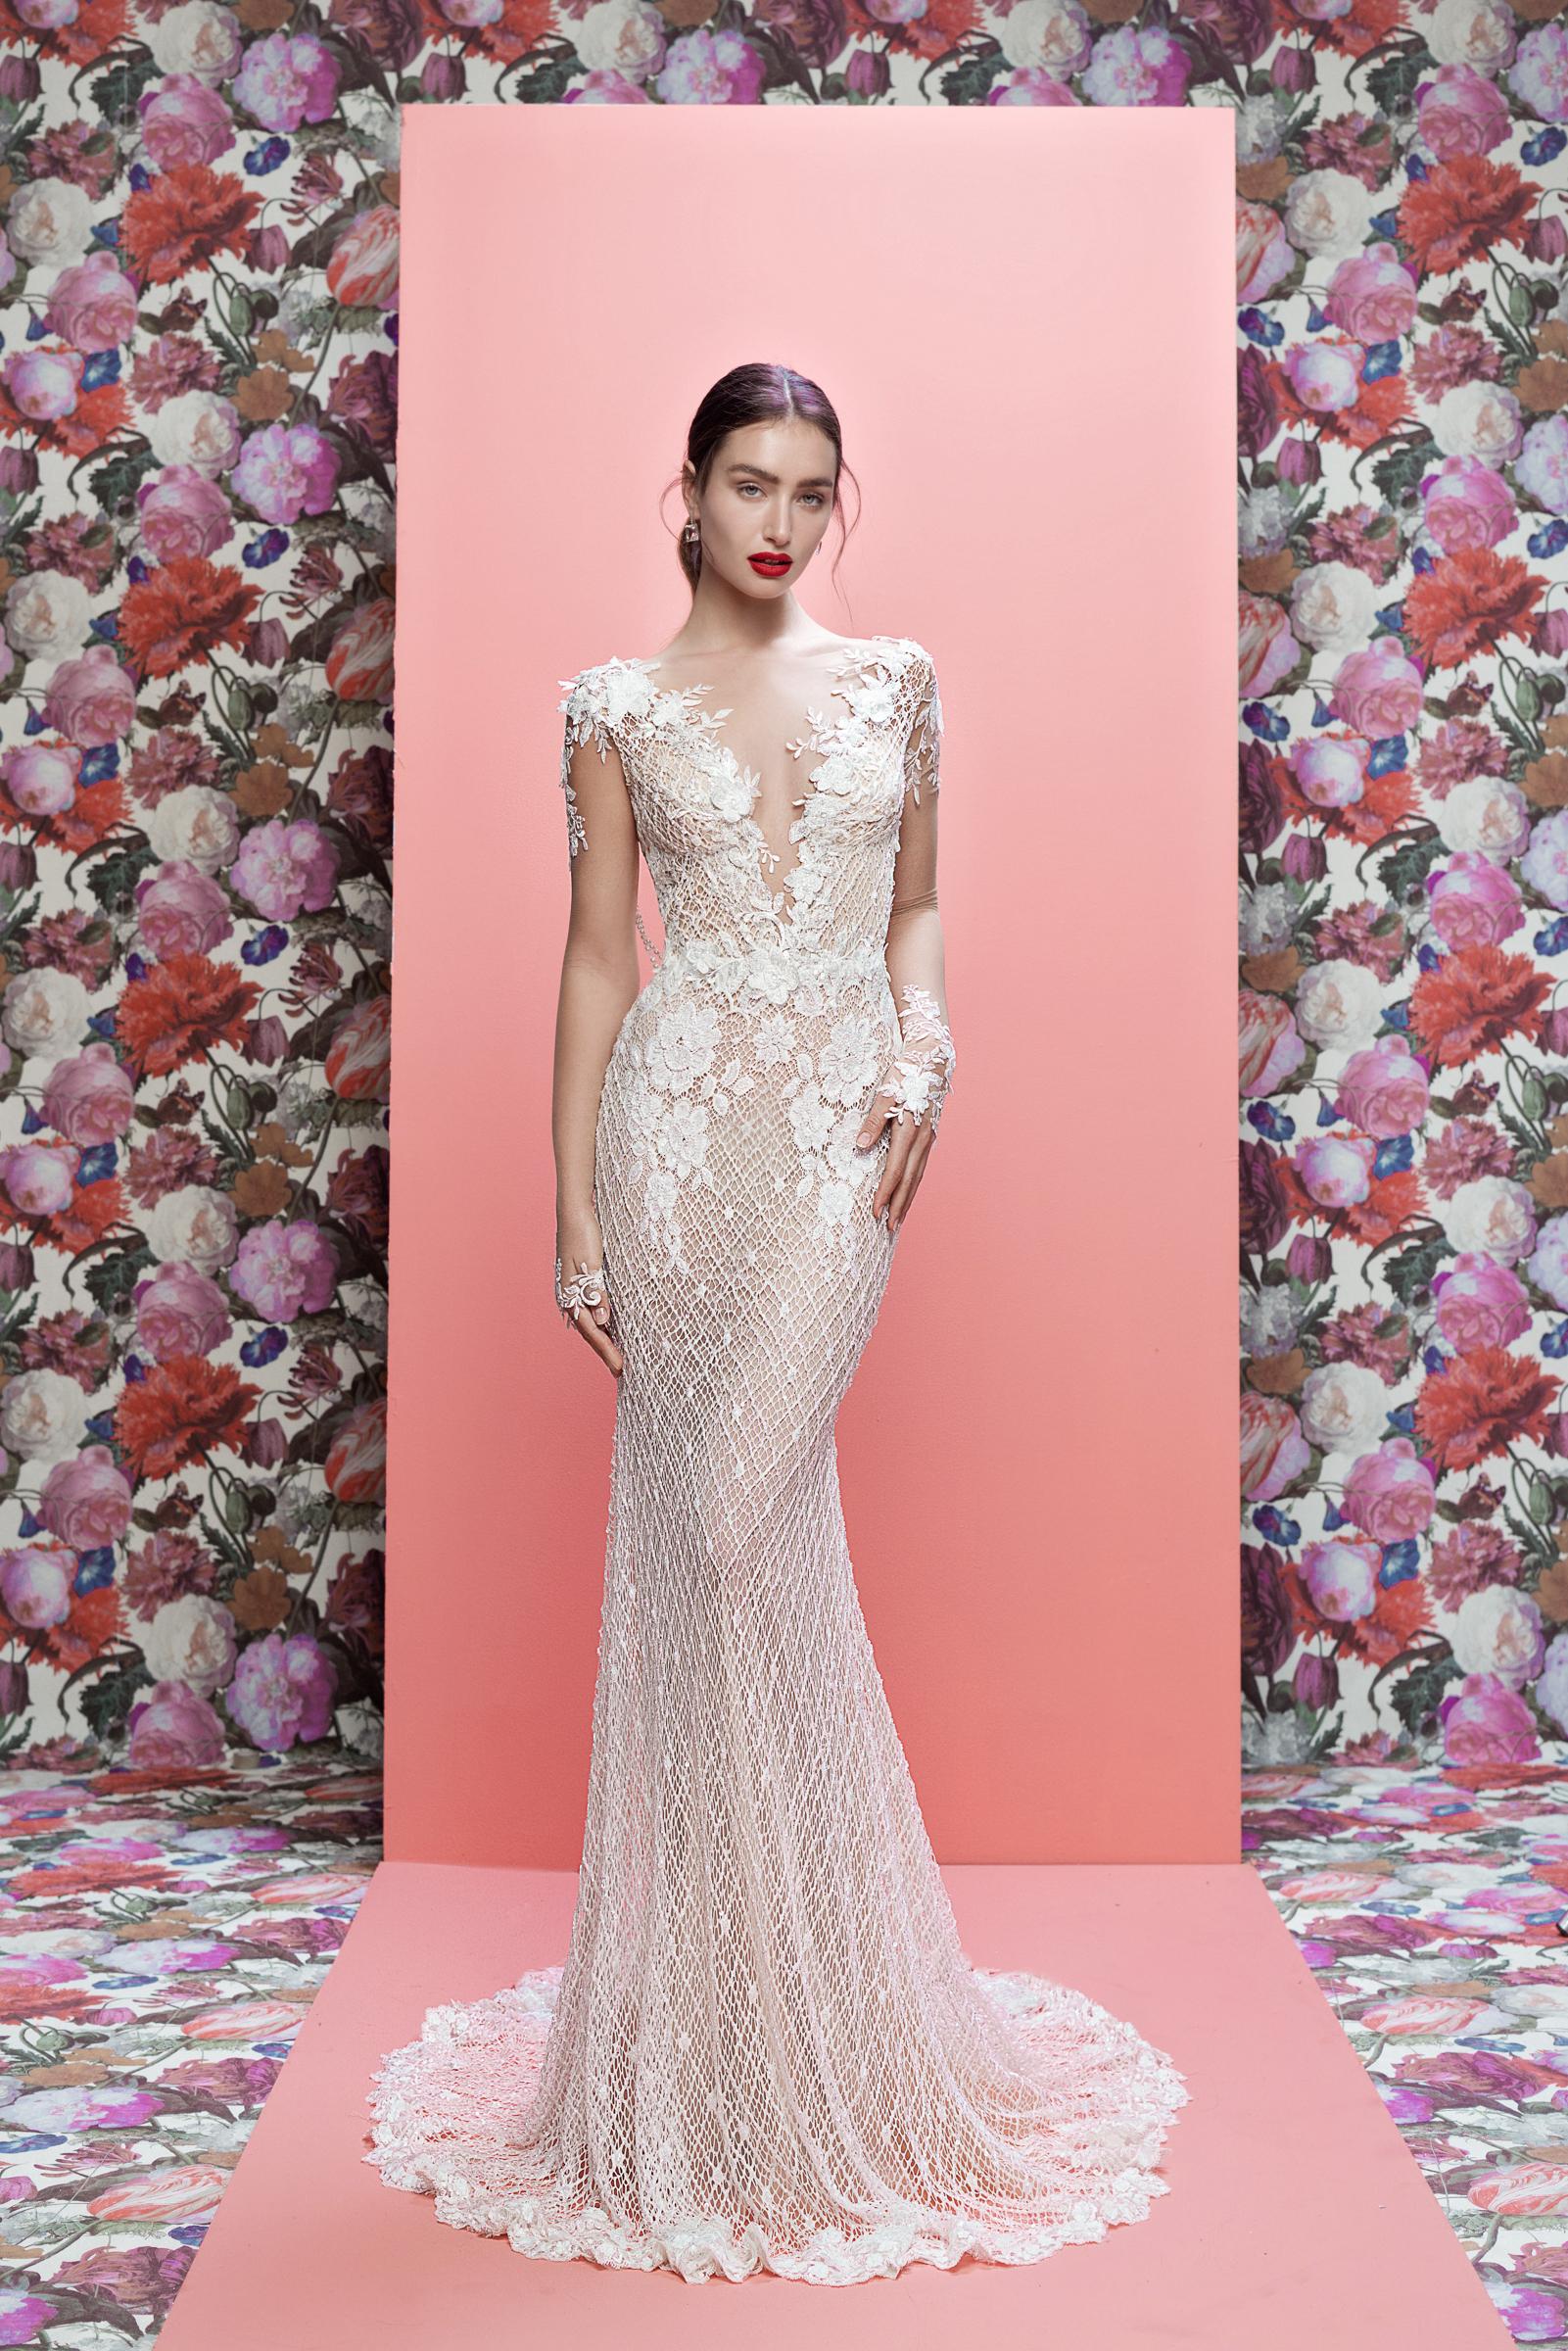 Galia Lahav wedding dress spring 2019 lace cap sleeve v-neck sheath